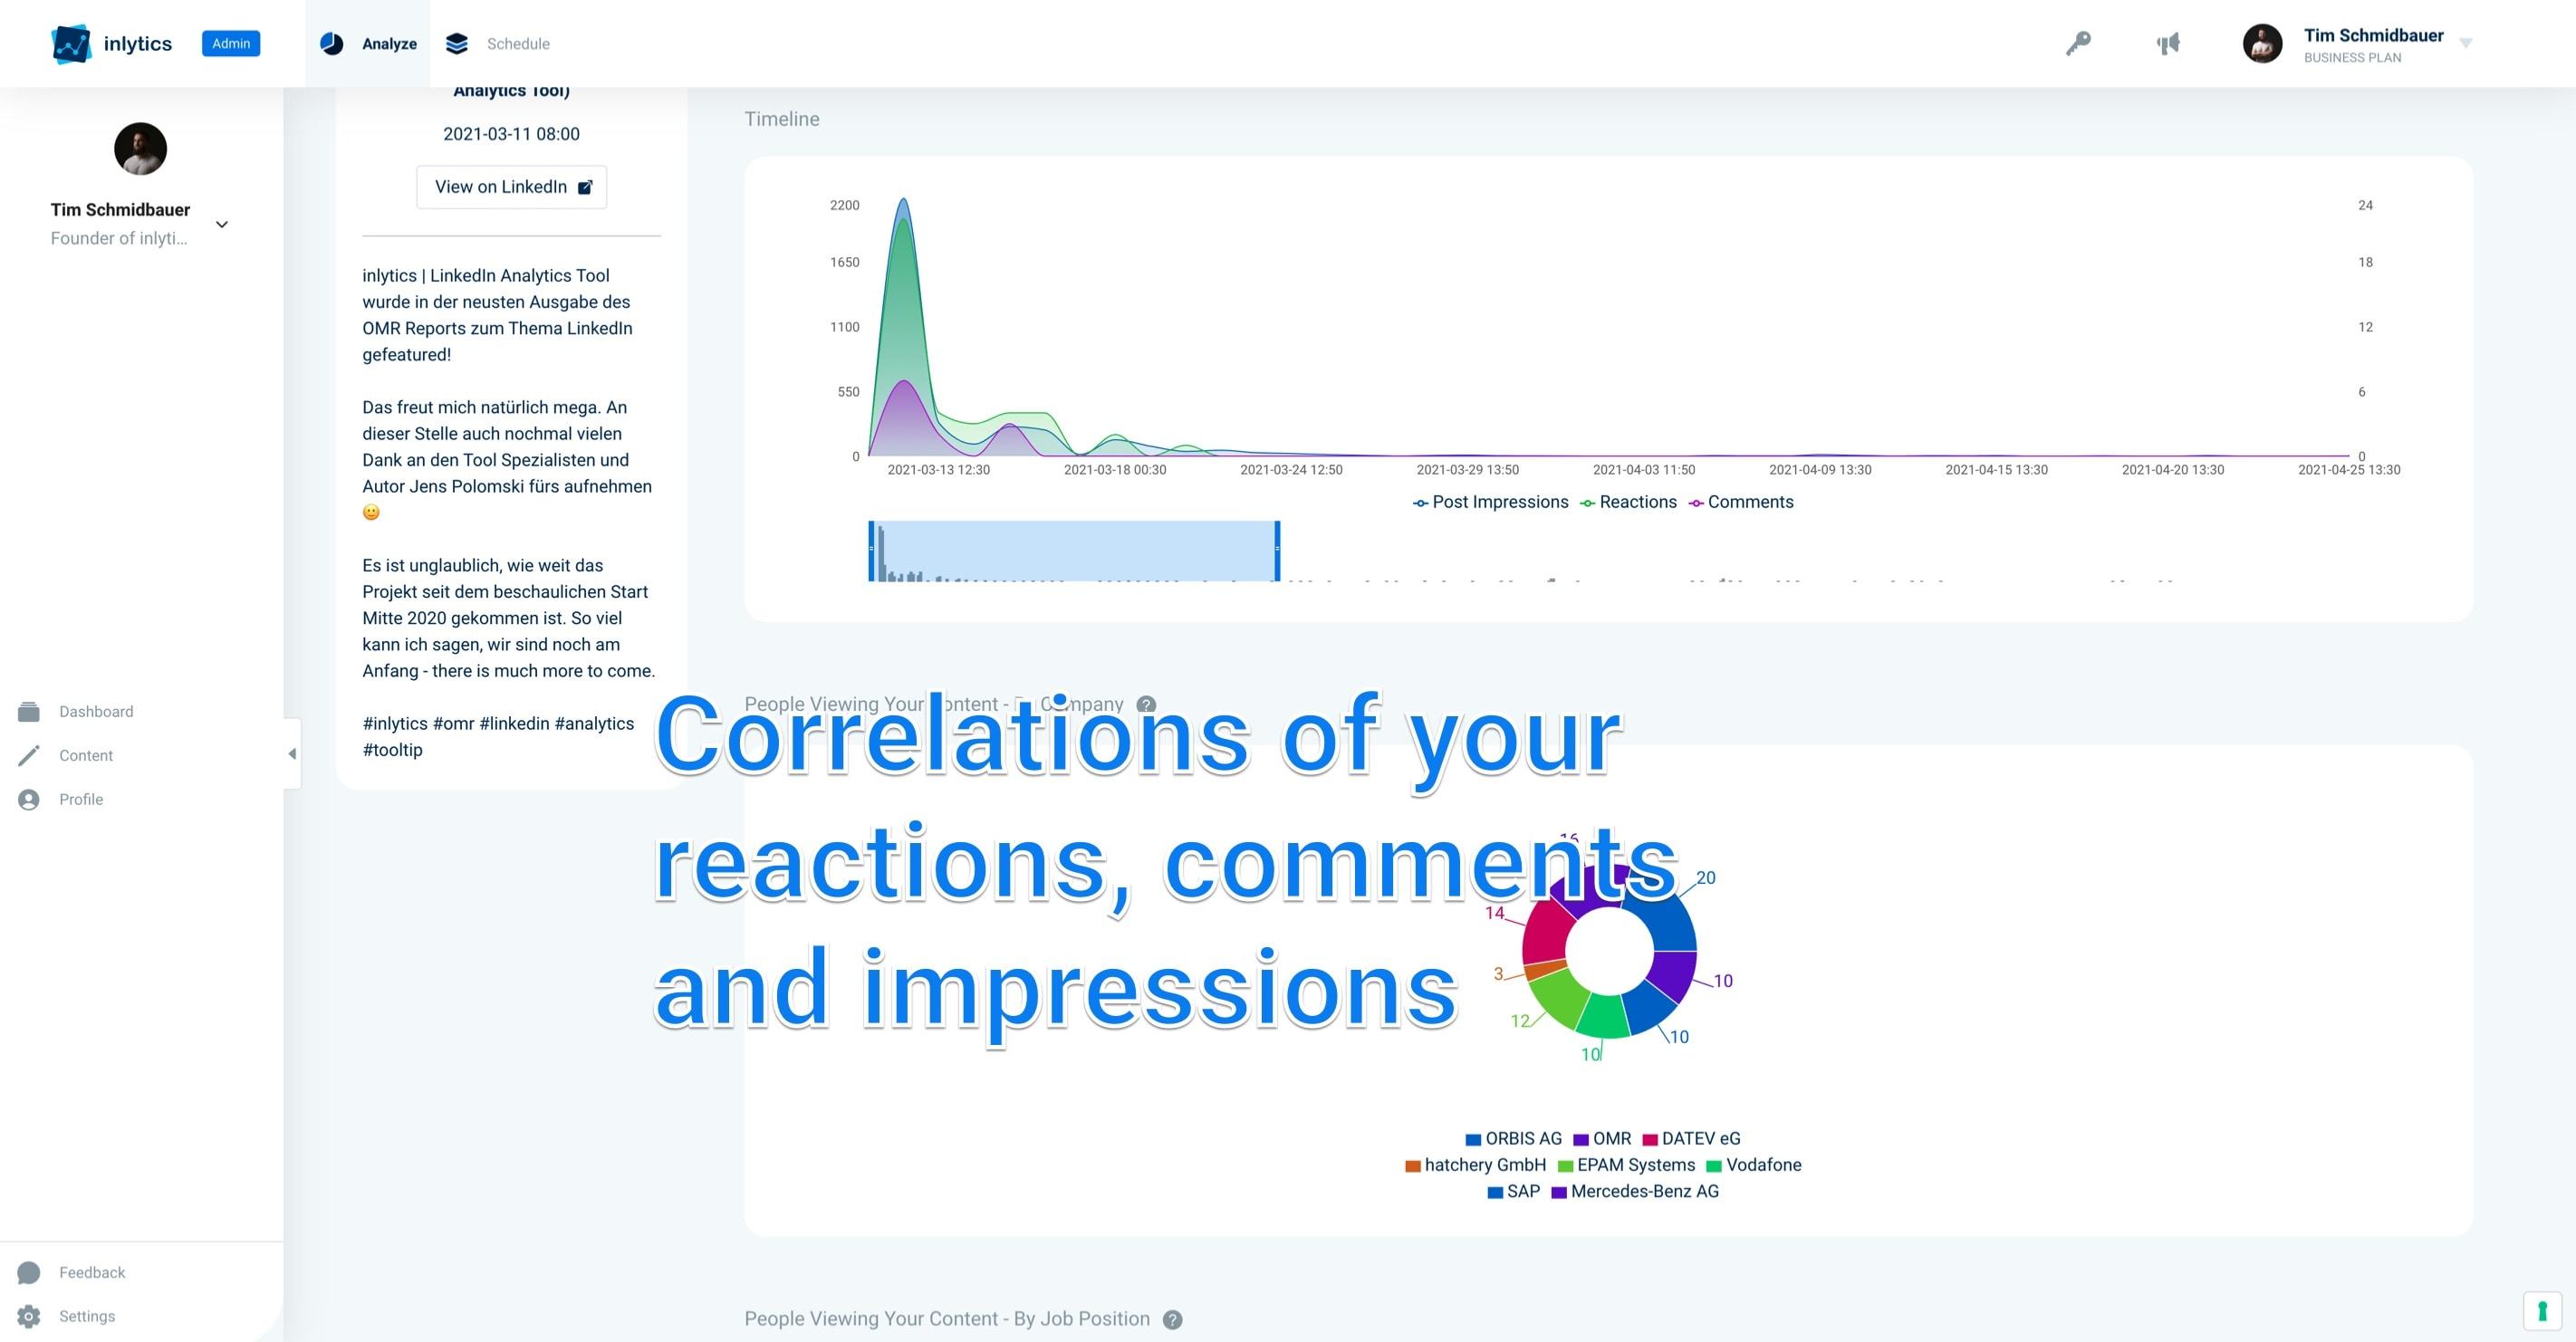 LinkedIn Dashboard Screenshot from inlytics.io showing the correlation of LinkedIn metrics